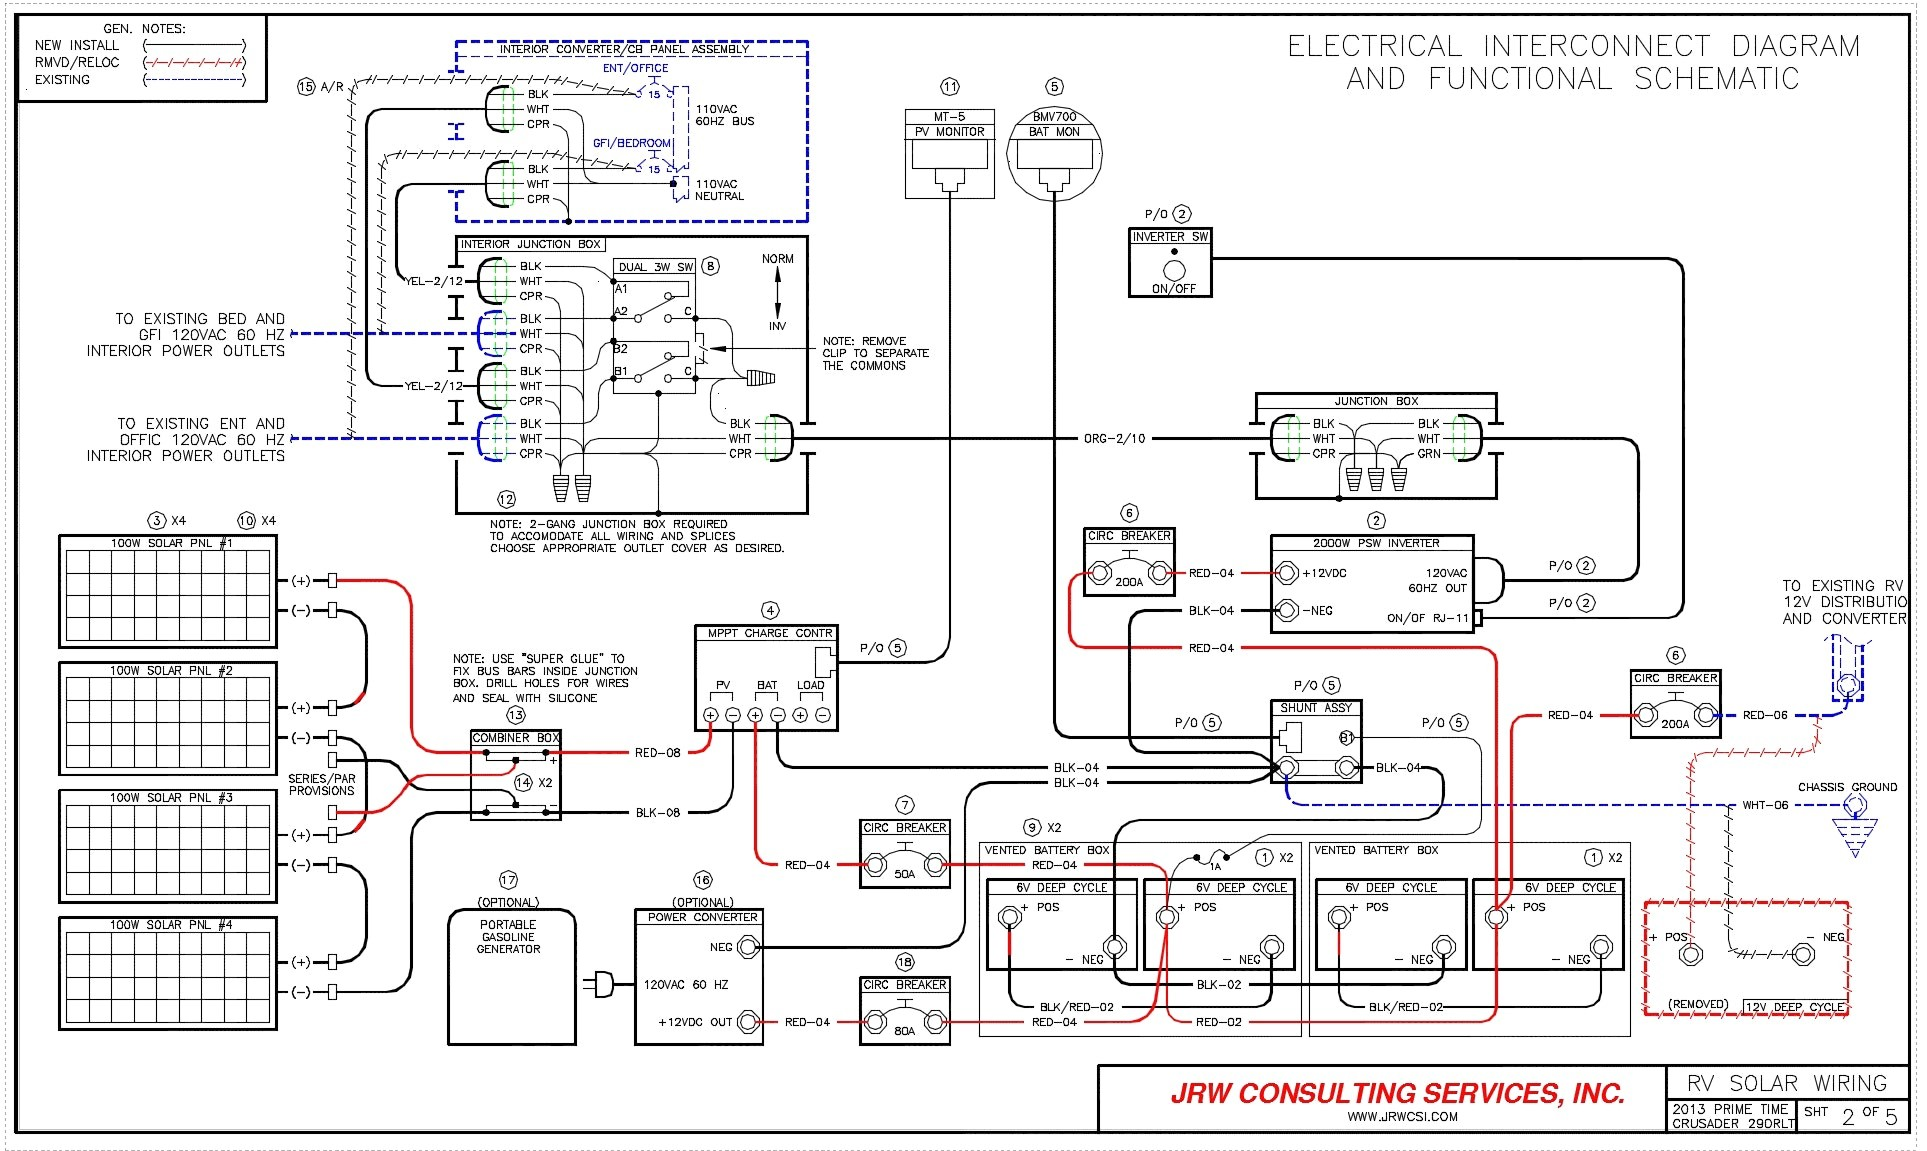 Onan Rv Generator Wiring Diagram | My Wiring DIagram